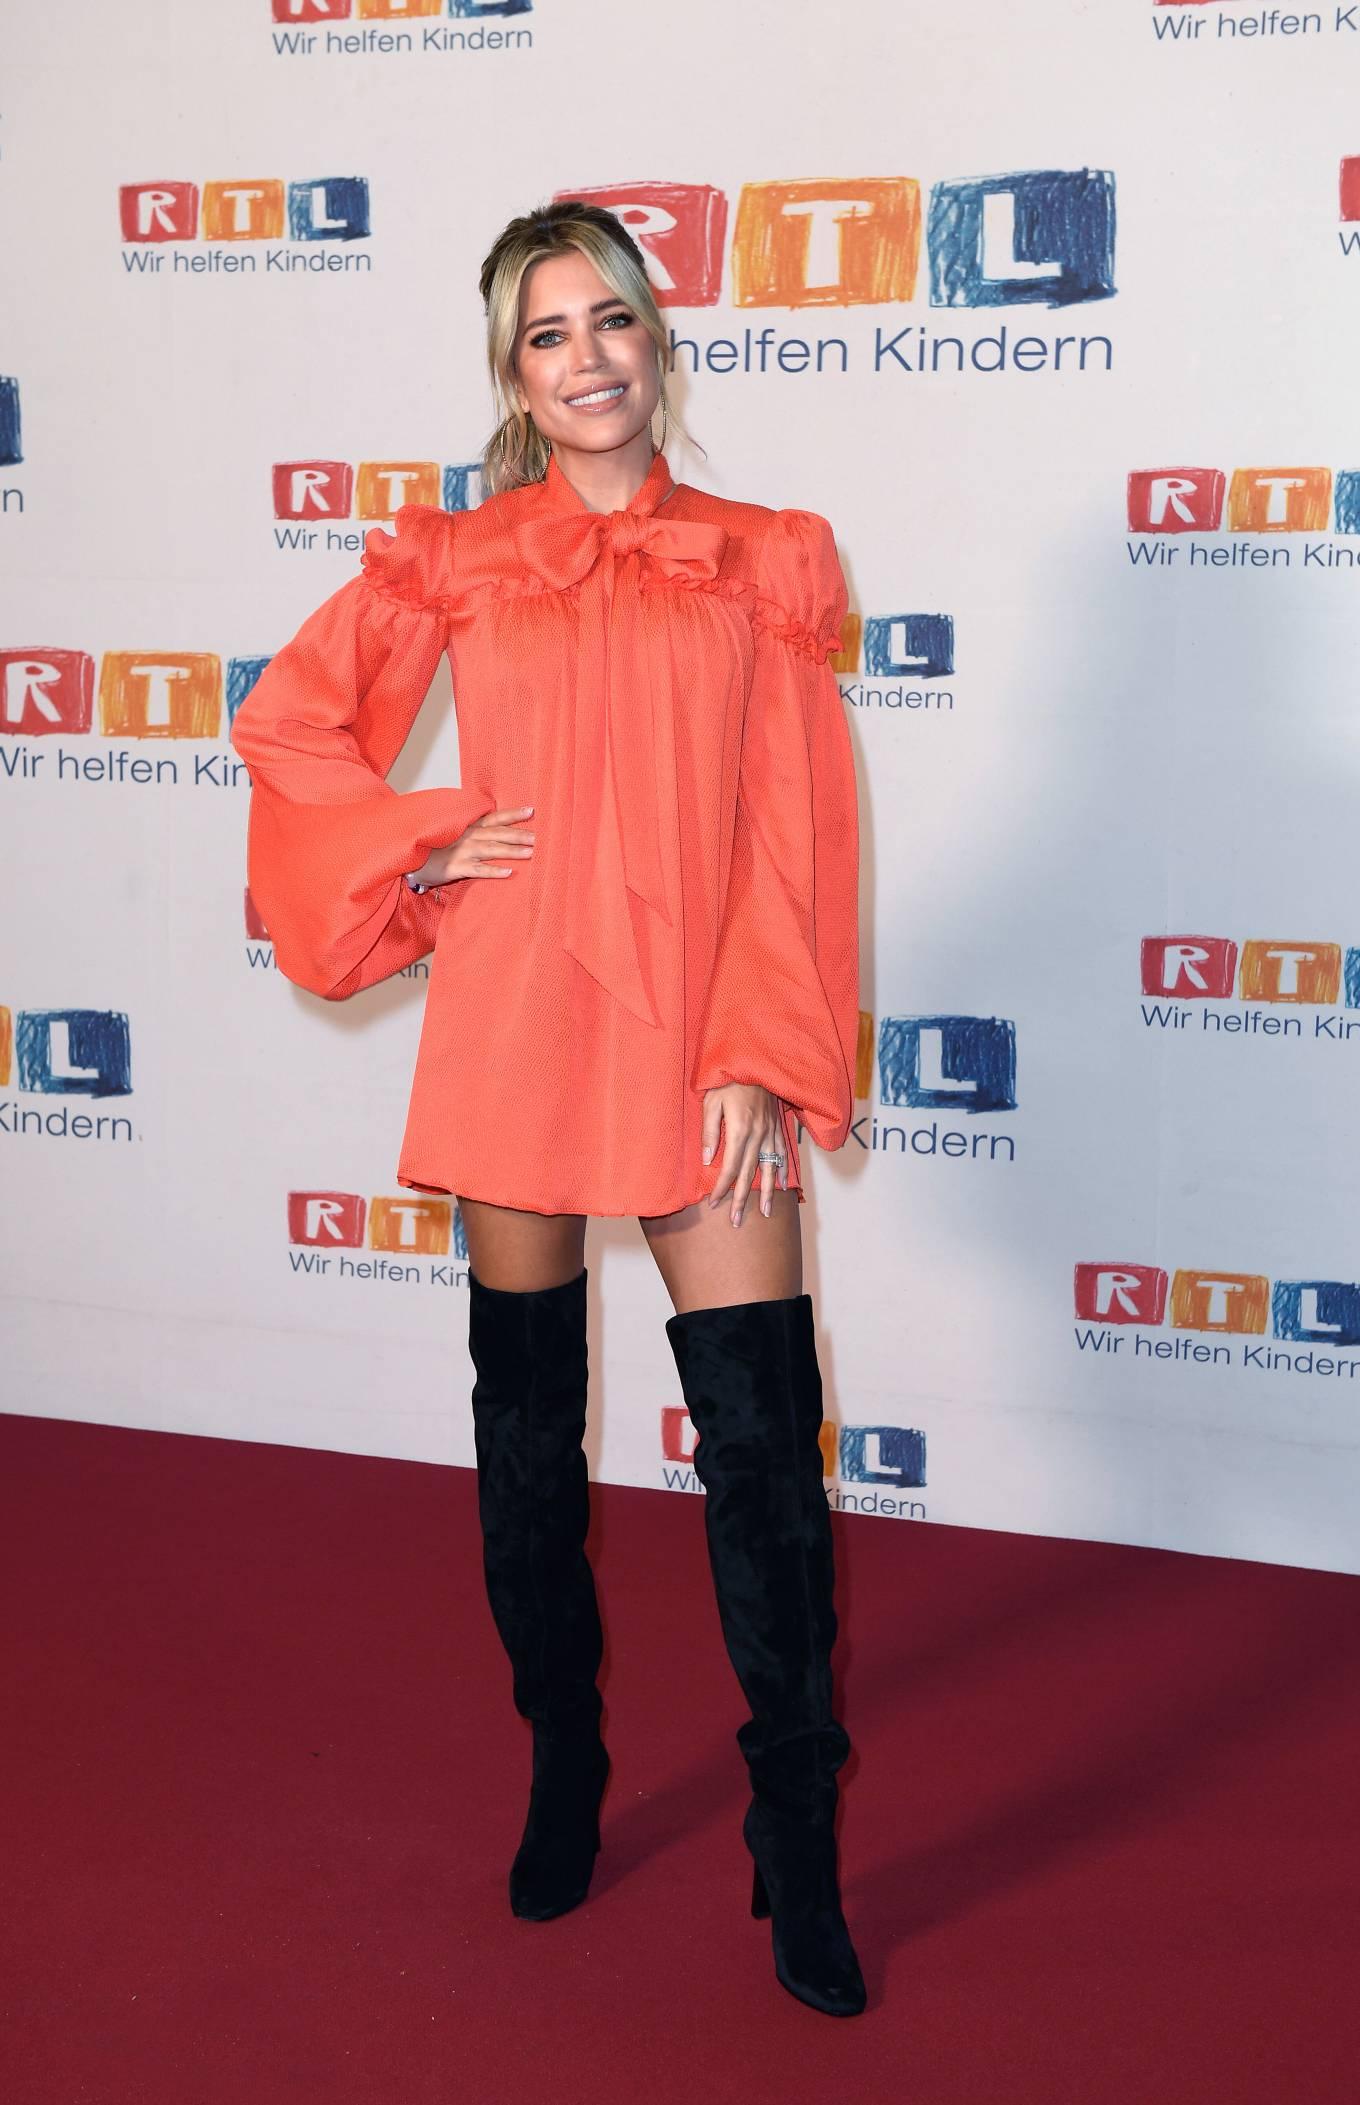 Sylvie Meis 2020 : Sylvie Meis – Red carpet at 2020 RTL Telethon in Huerth-10